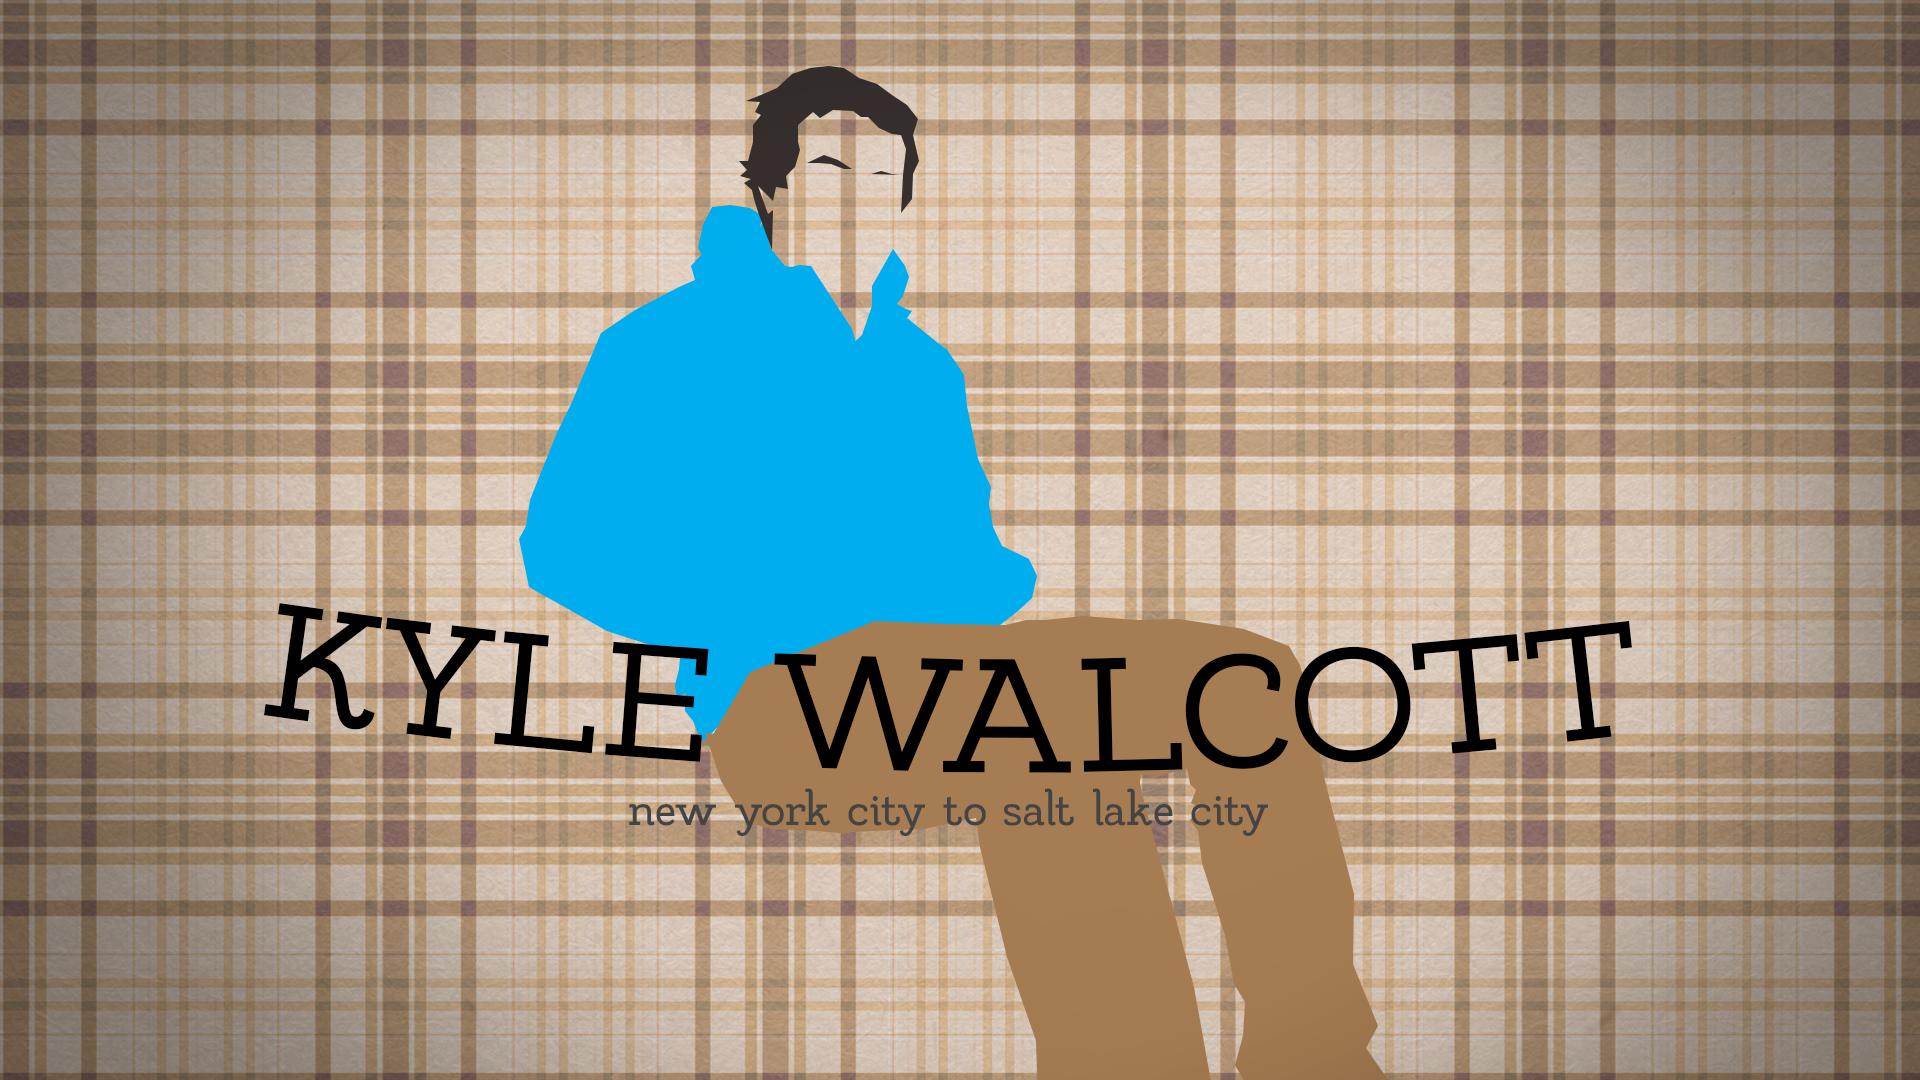 KYLE WALCOTT FINAL.png